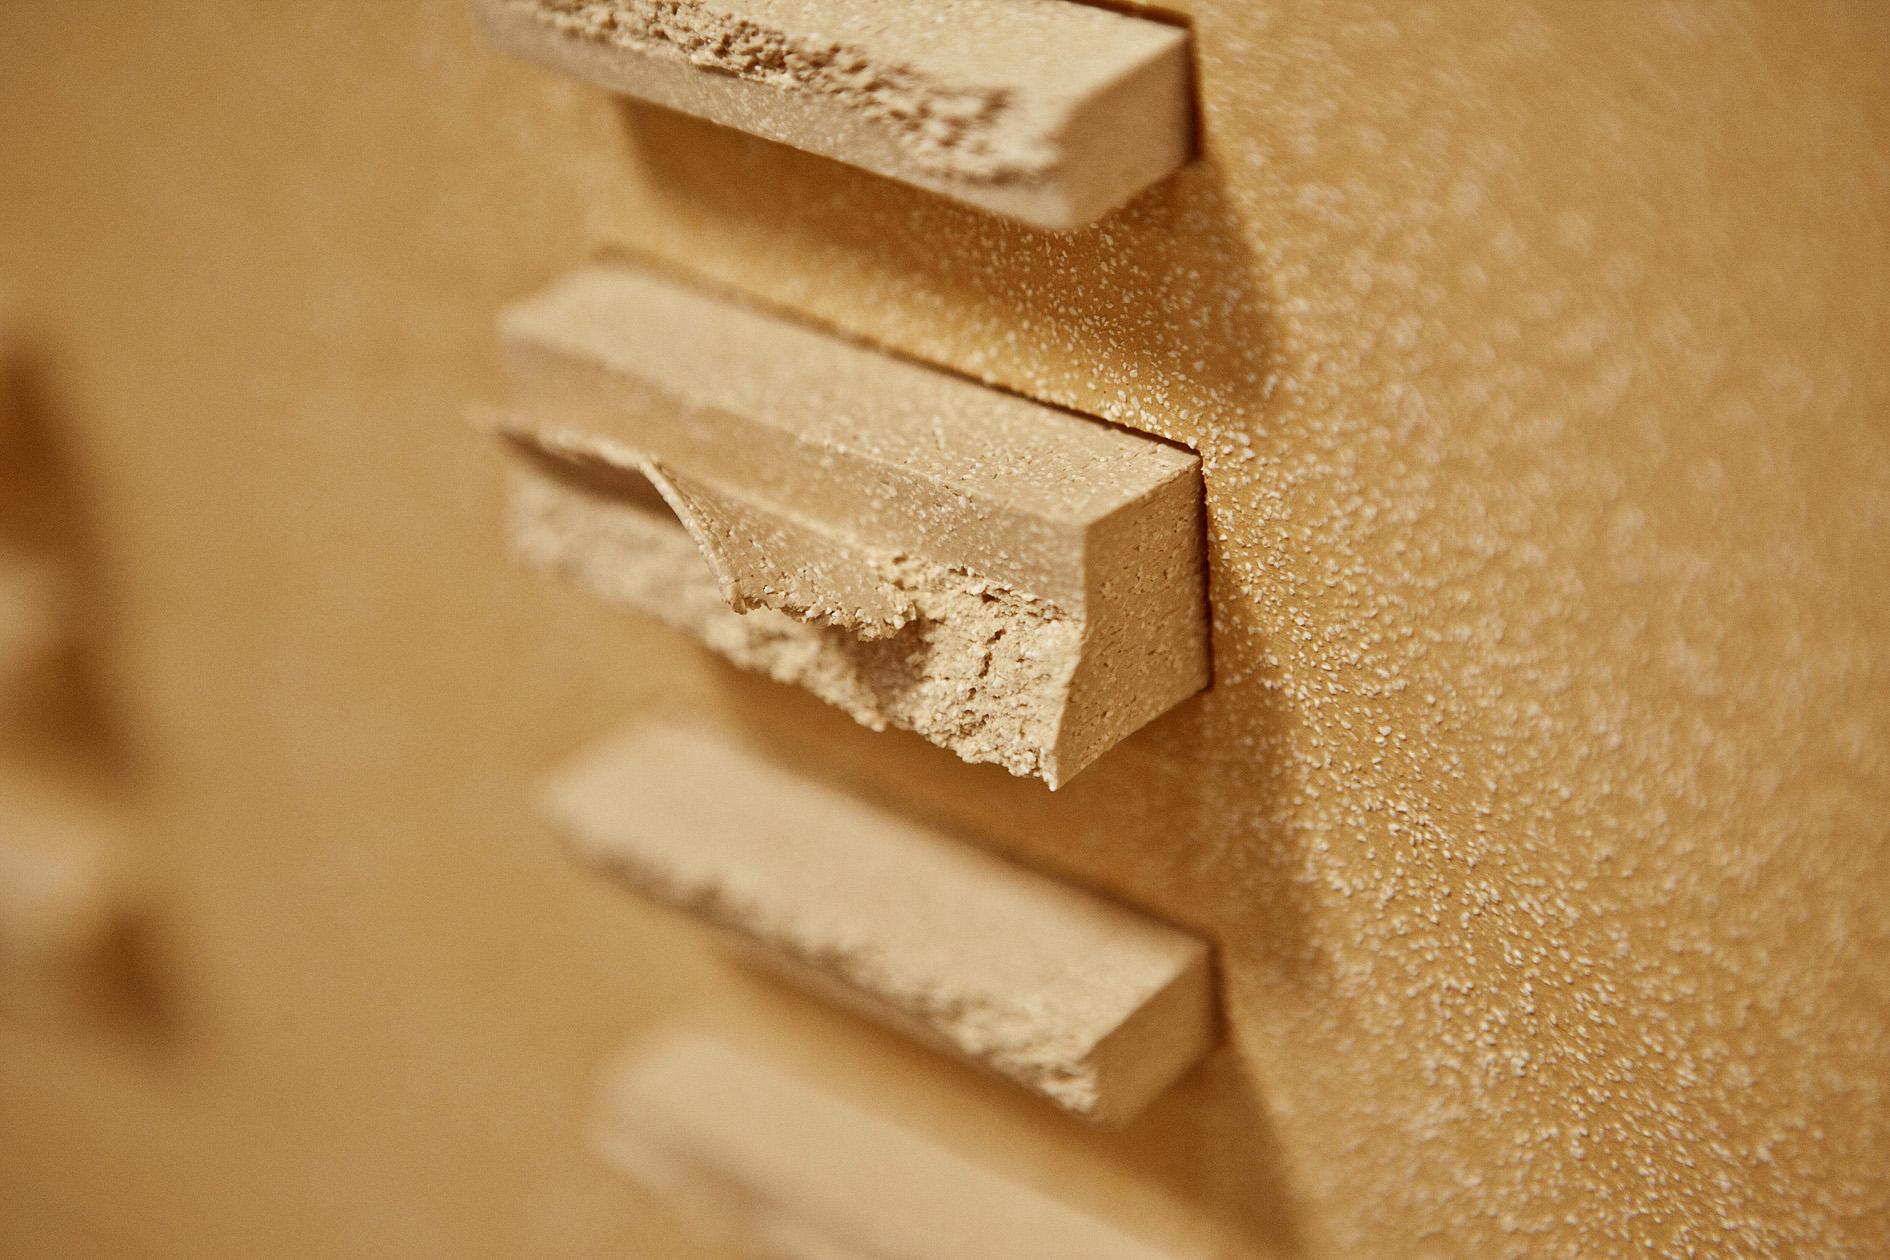 a1_mdba_mdby_ceramics_installations_manufactured_jacobvanderbeugel